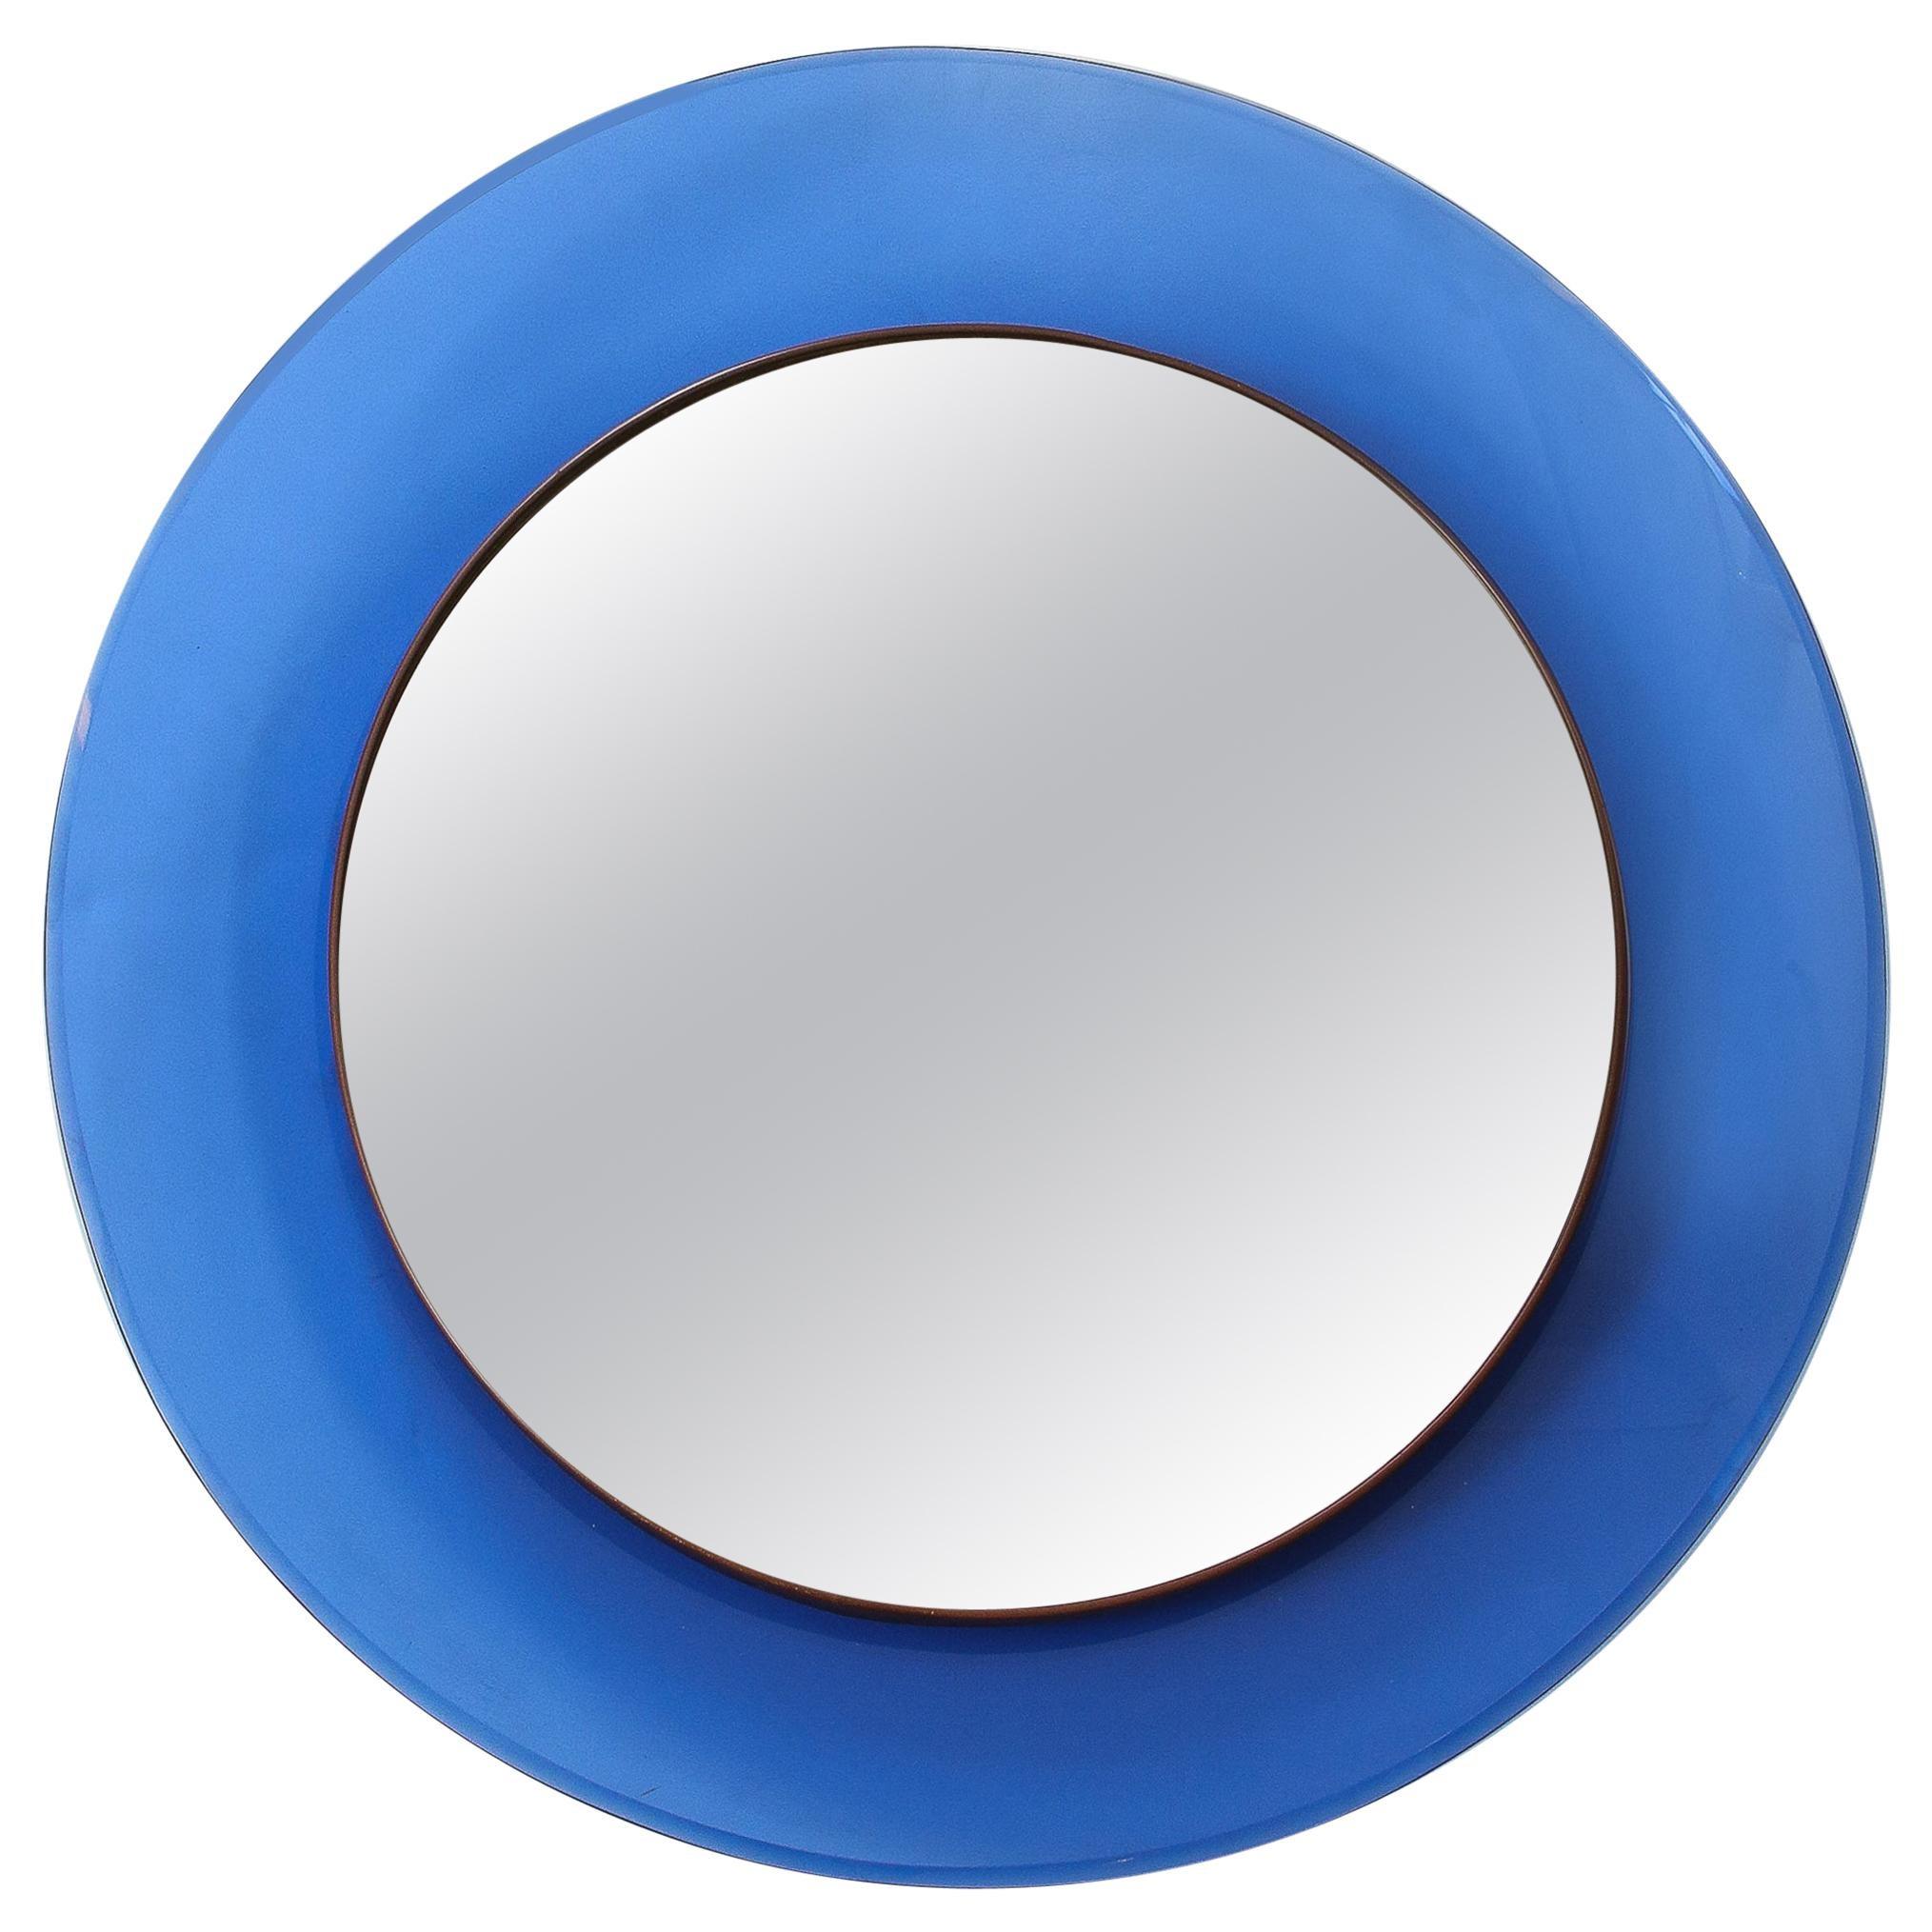 Max Ingrand for Fontana Arte Blue Mirror Model 1669